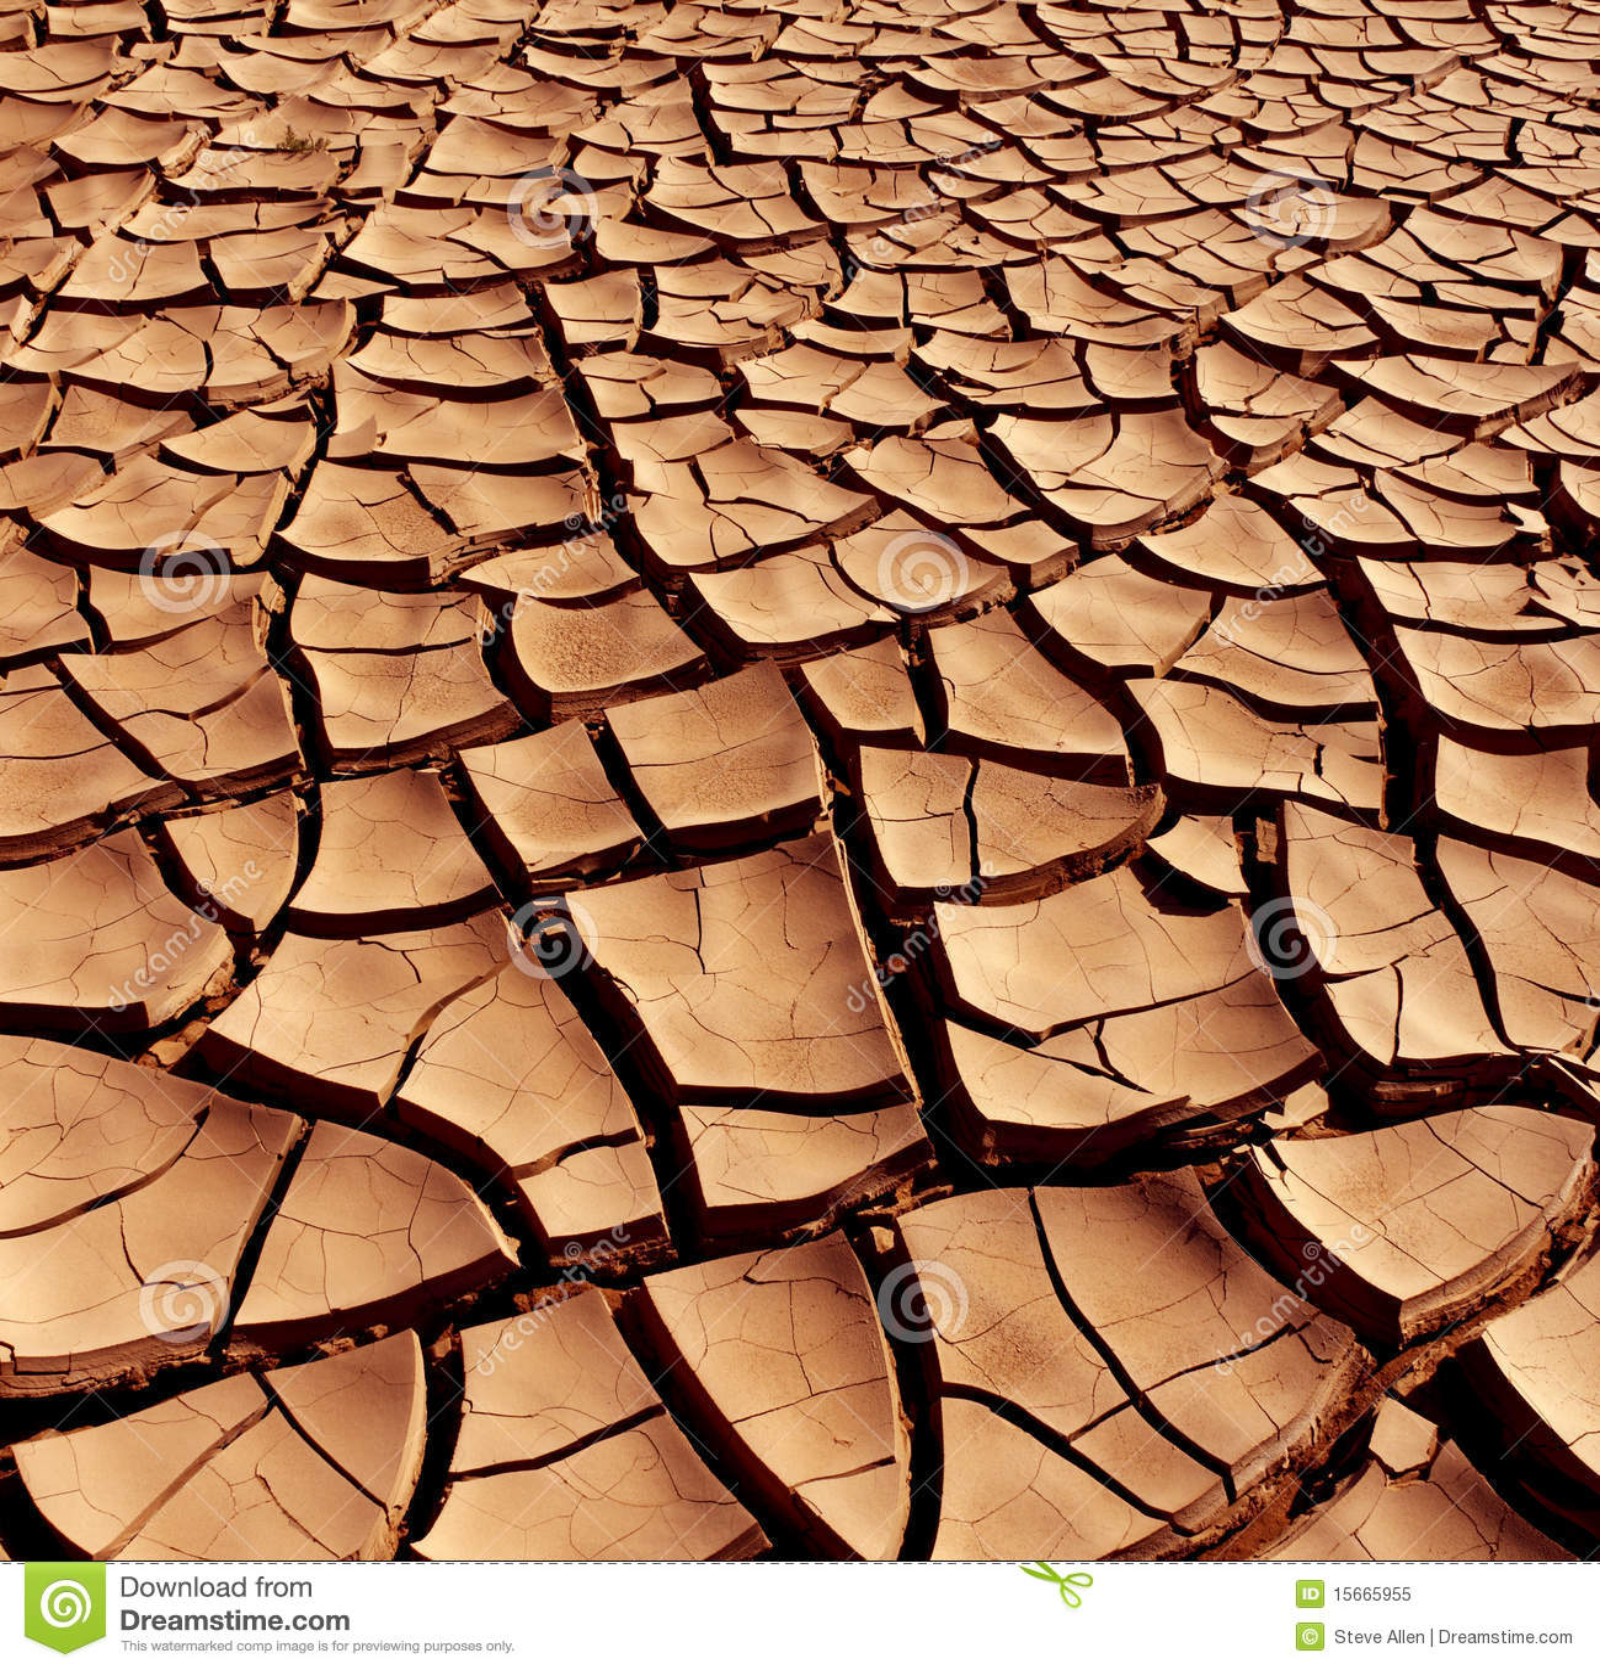 Tierra agrietada seca - desierto